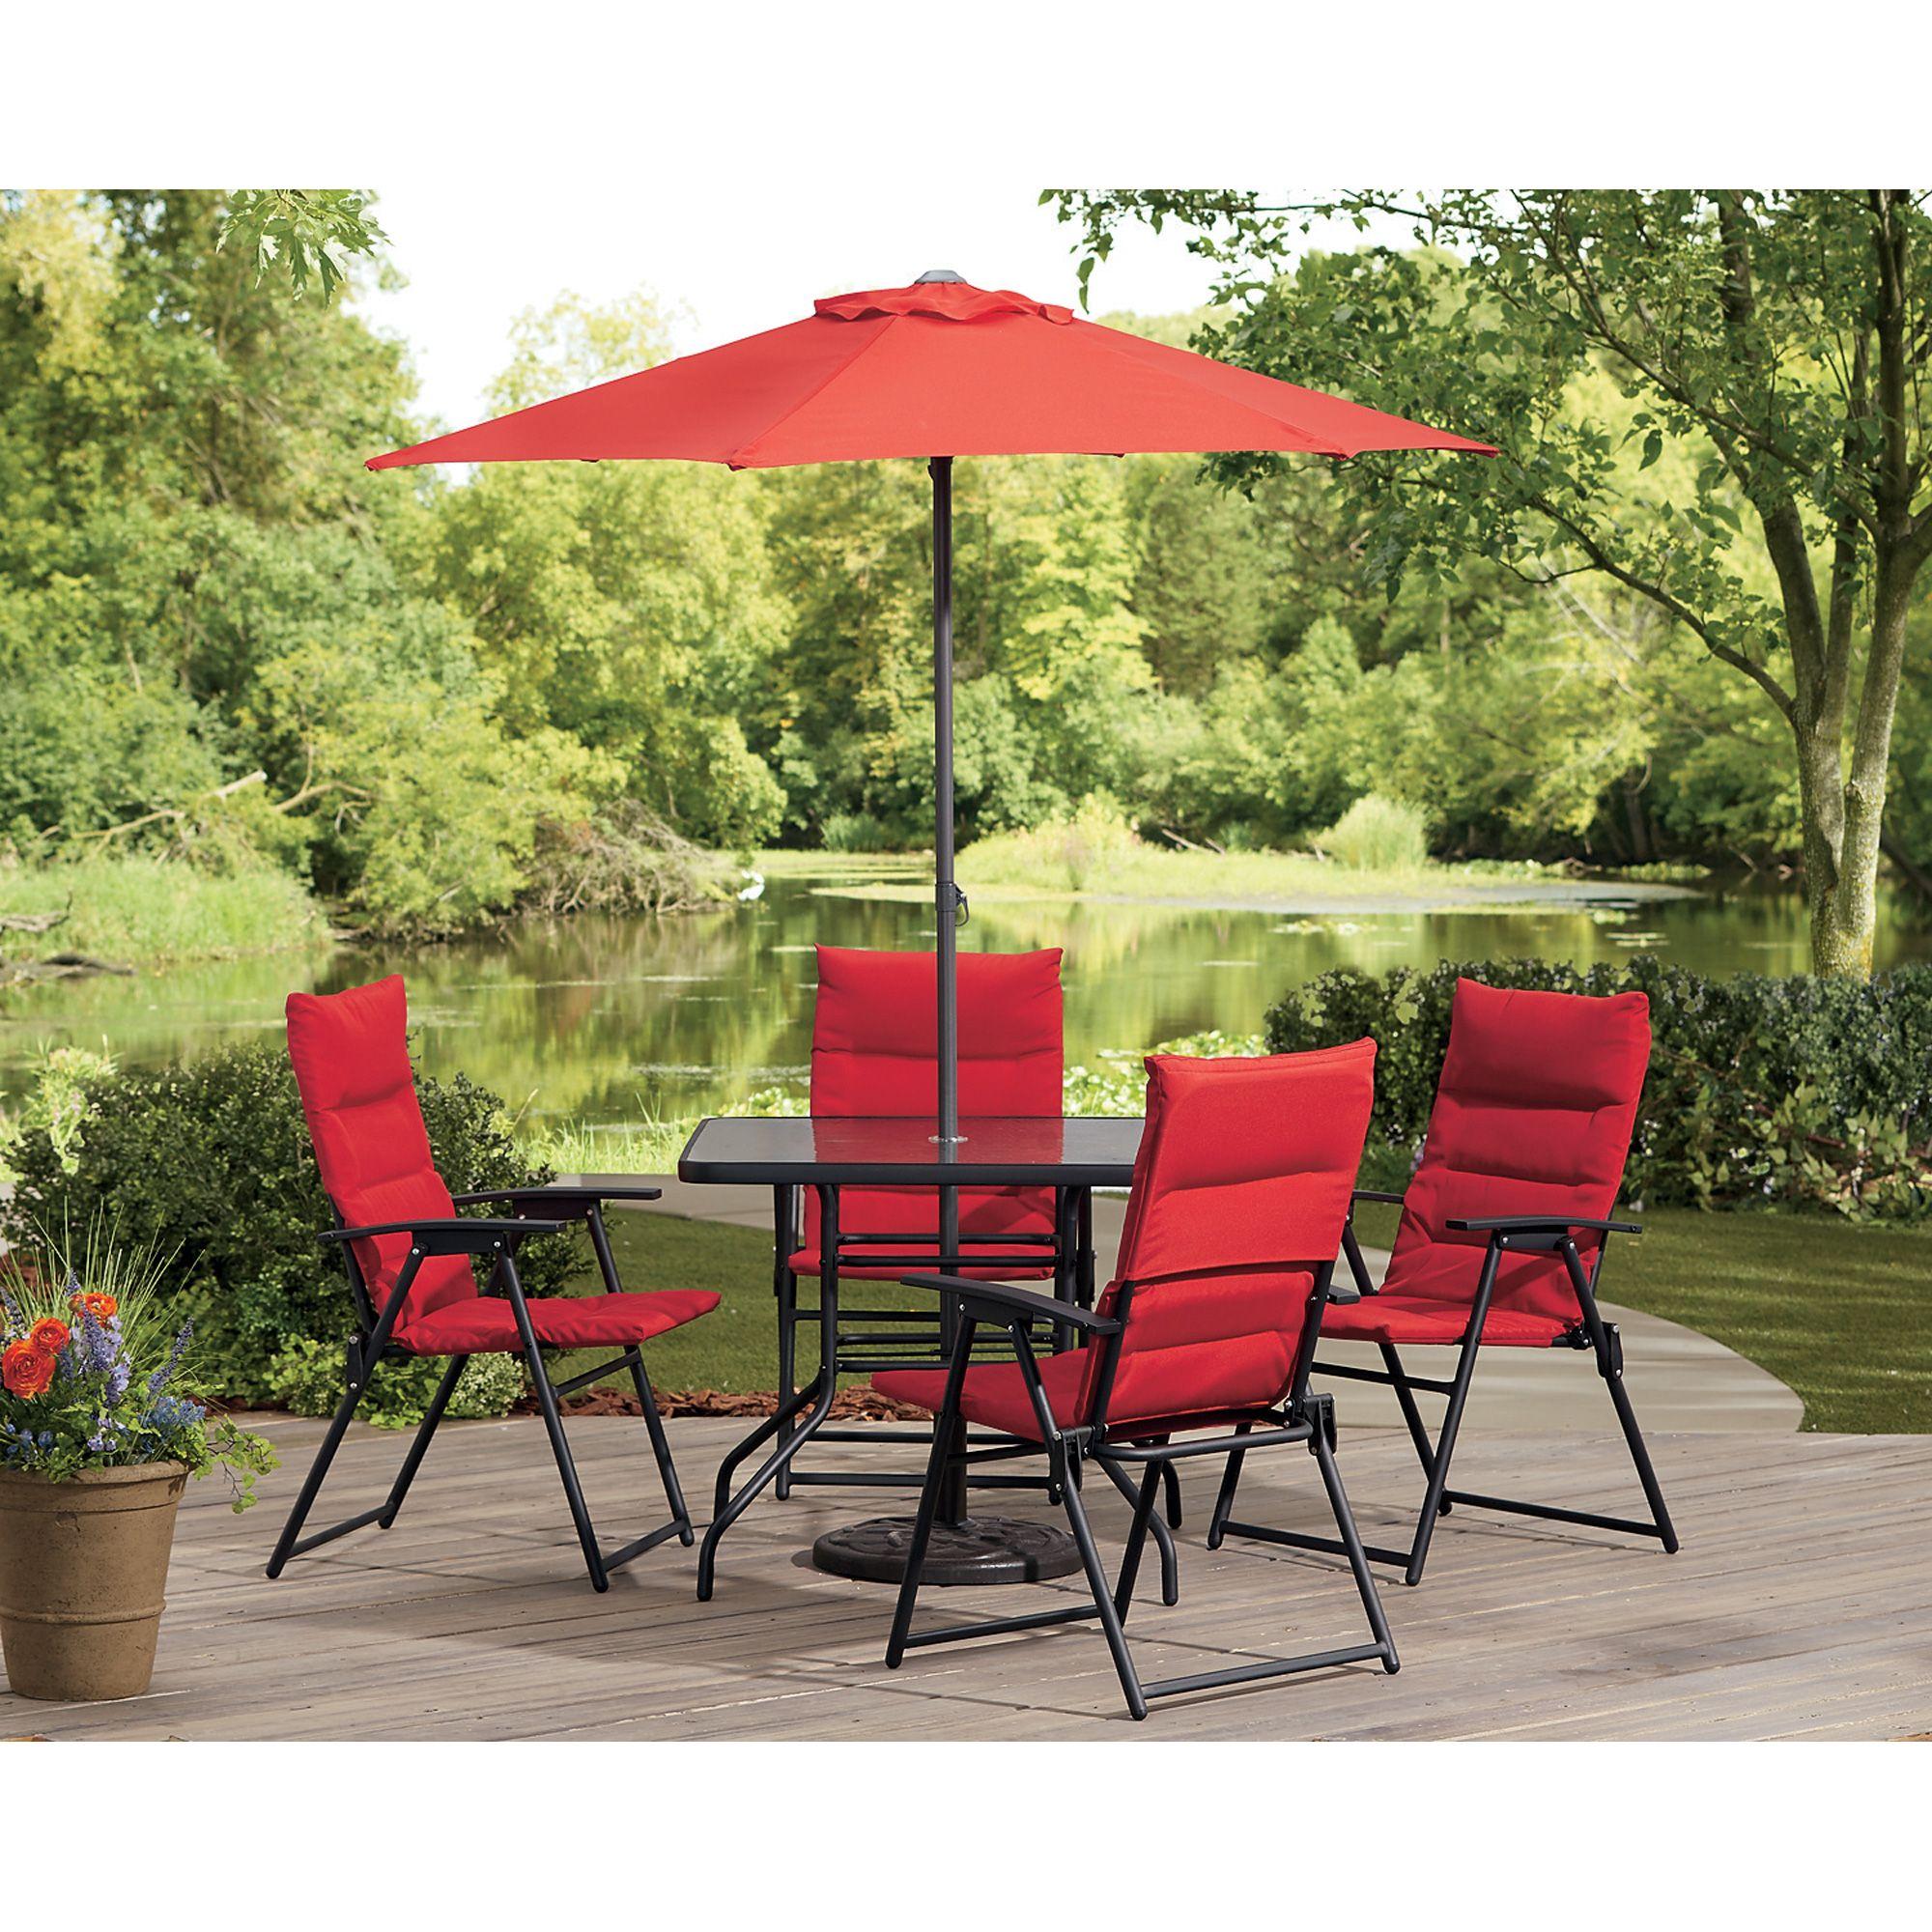 Outdoor Patio Furniture Dining Set